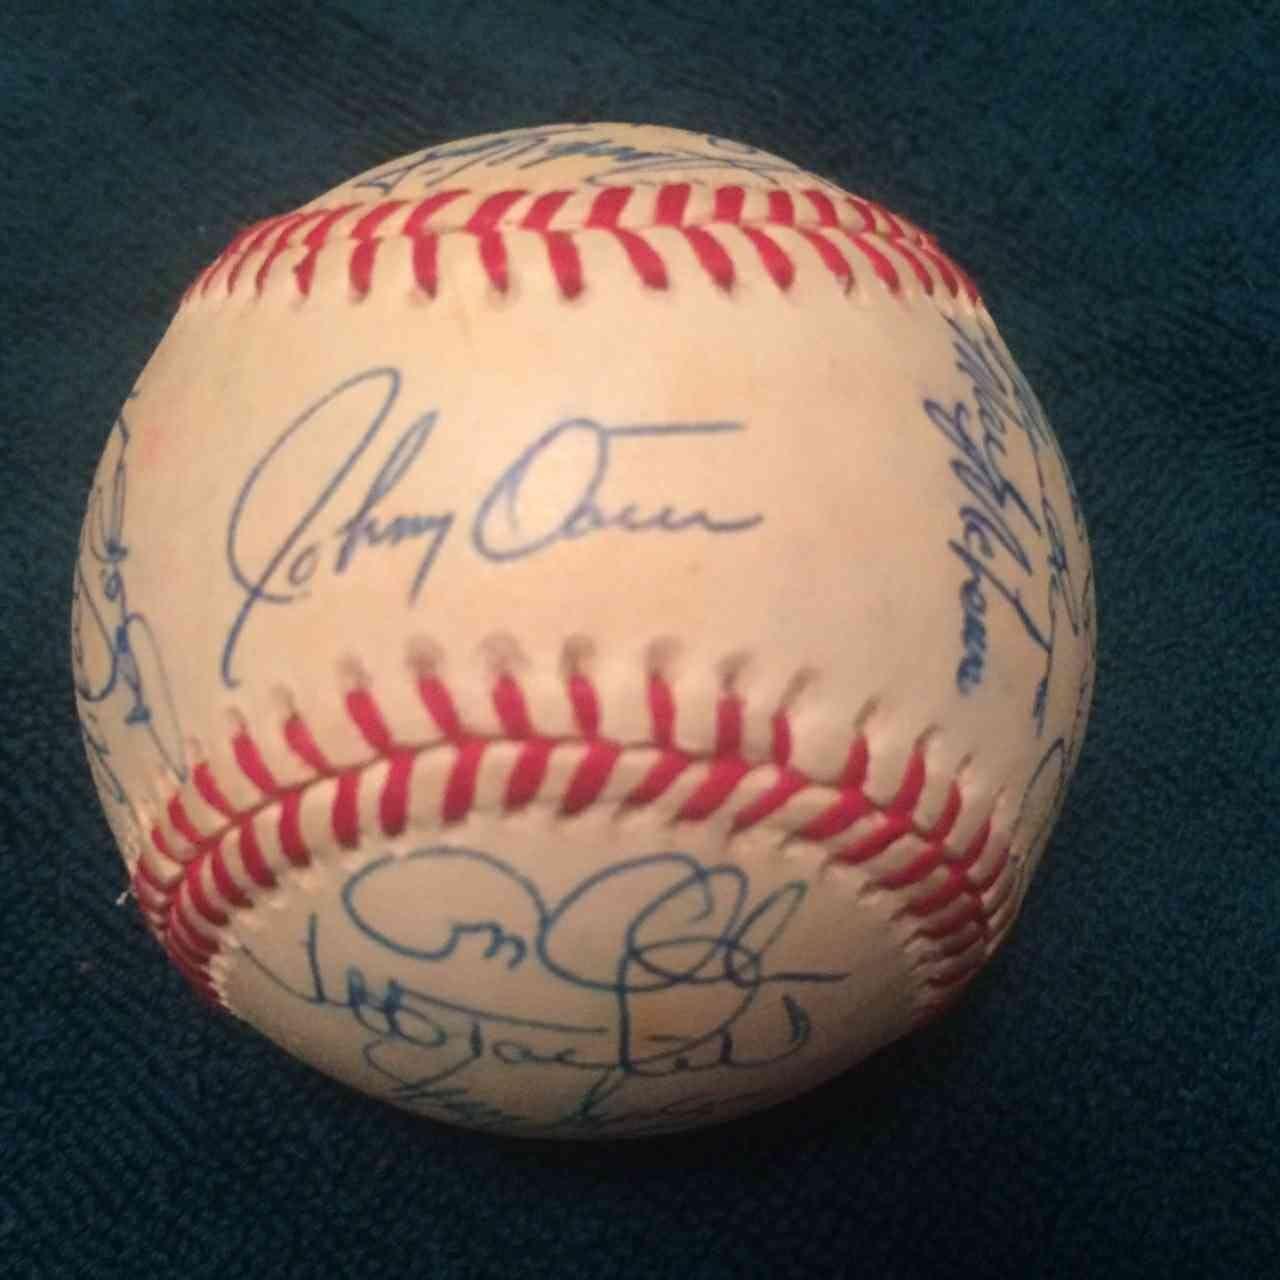 1993 Baltimore Orioles Team Signed Autographed Baseball – 27 Signatures w/PSA/DNA LOA [#a30]